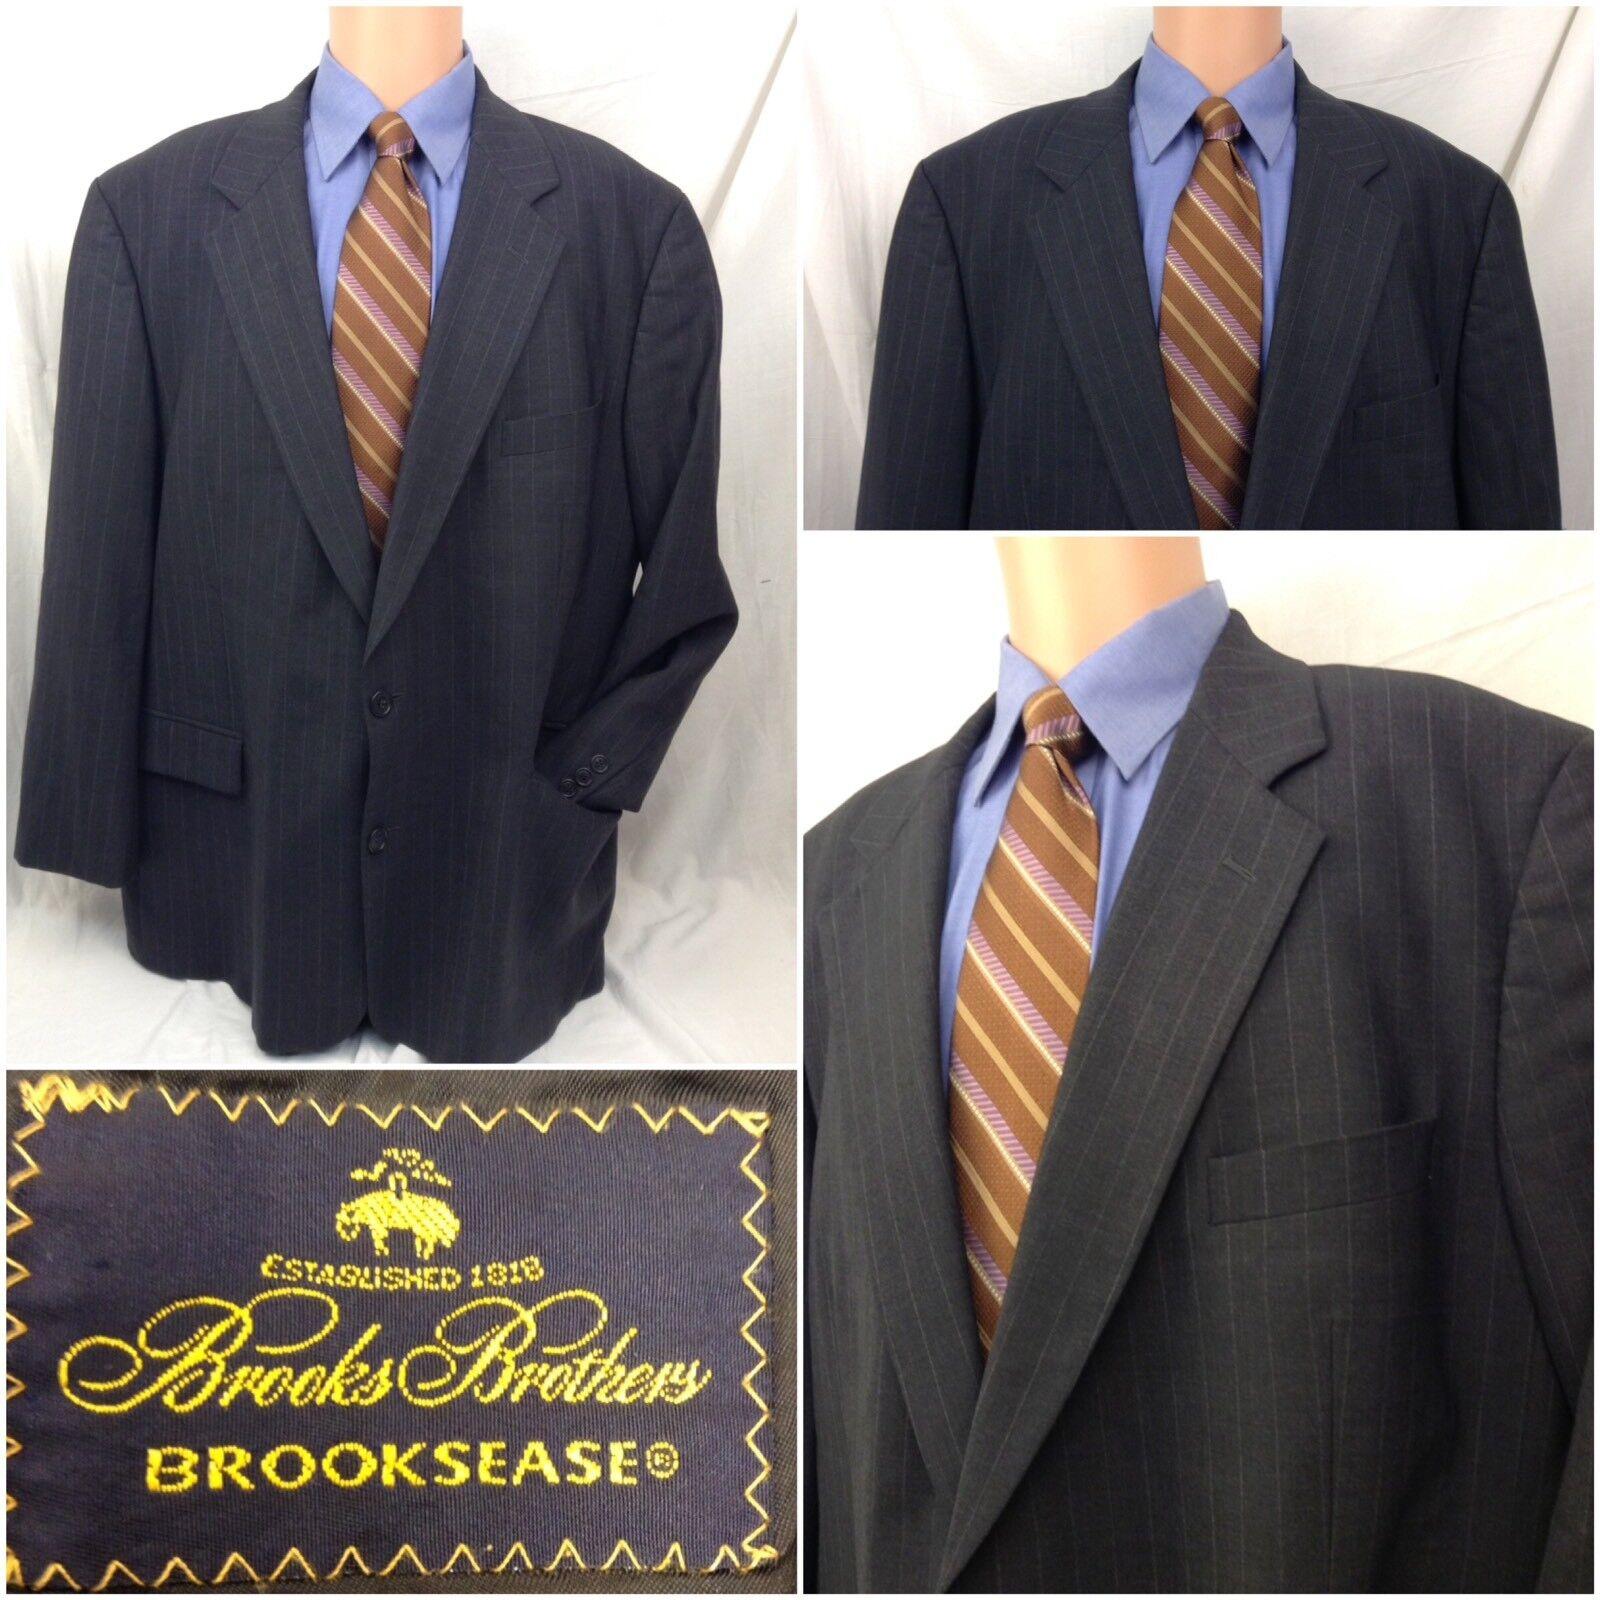 Brooks Brothers Brooksease Blazer 48R grau Pinstripe 2b 1v Isreal Mint A355